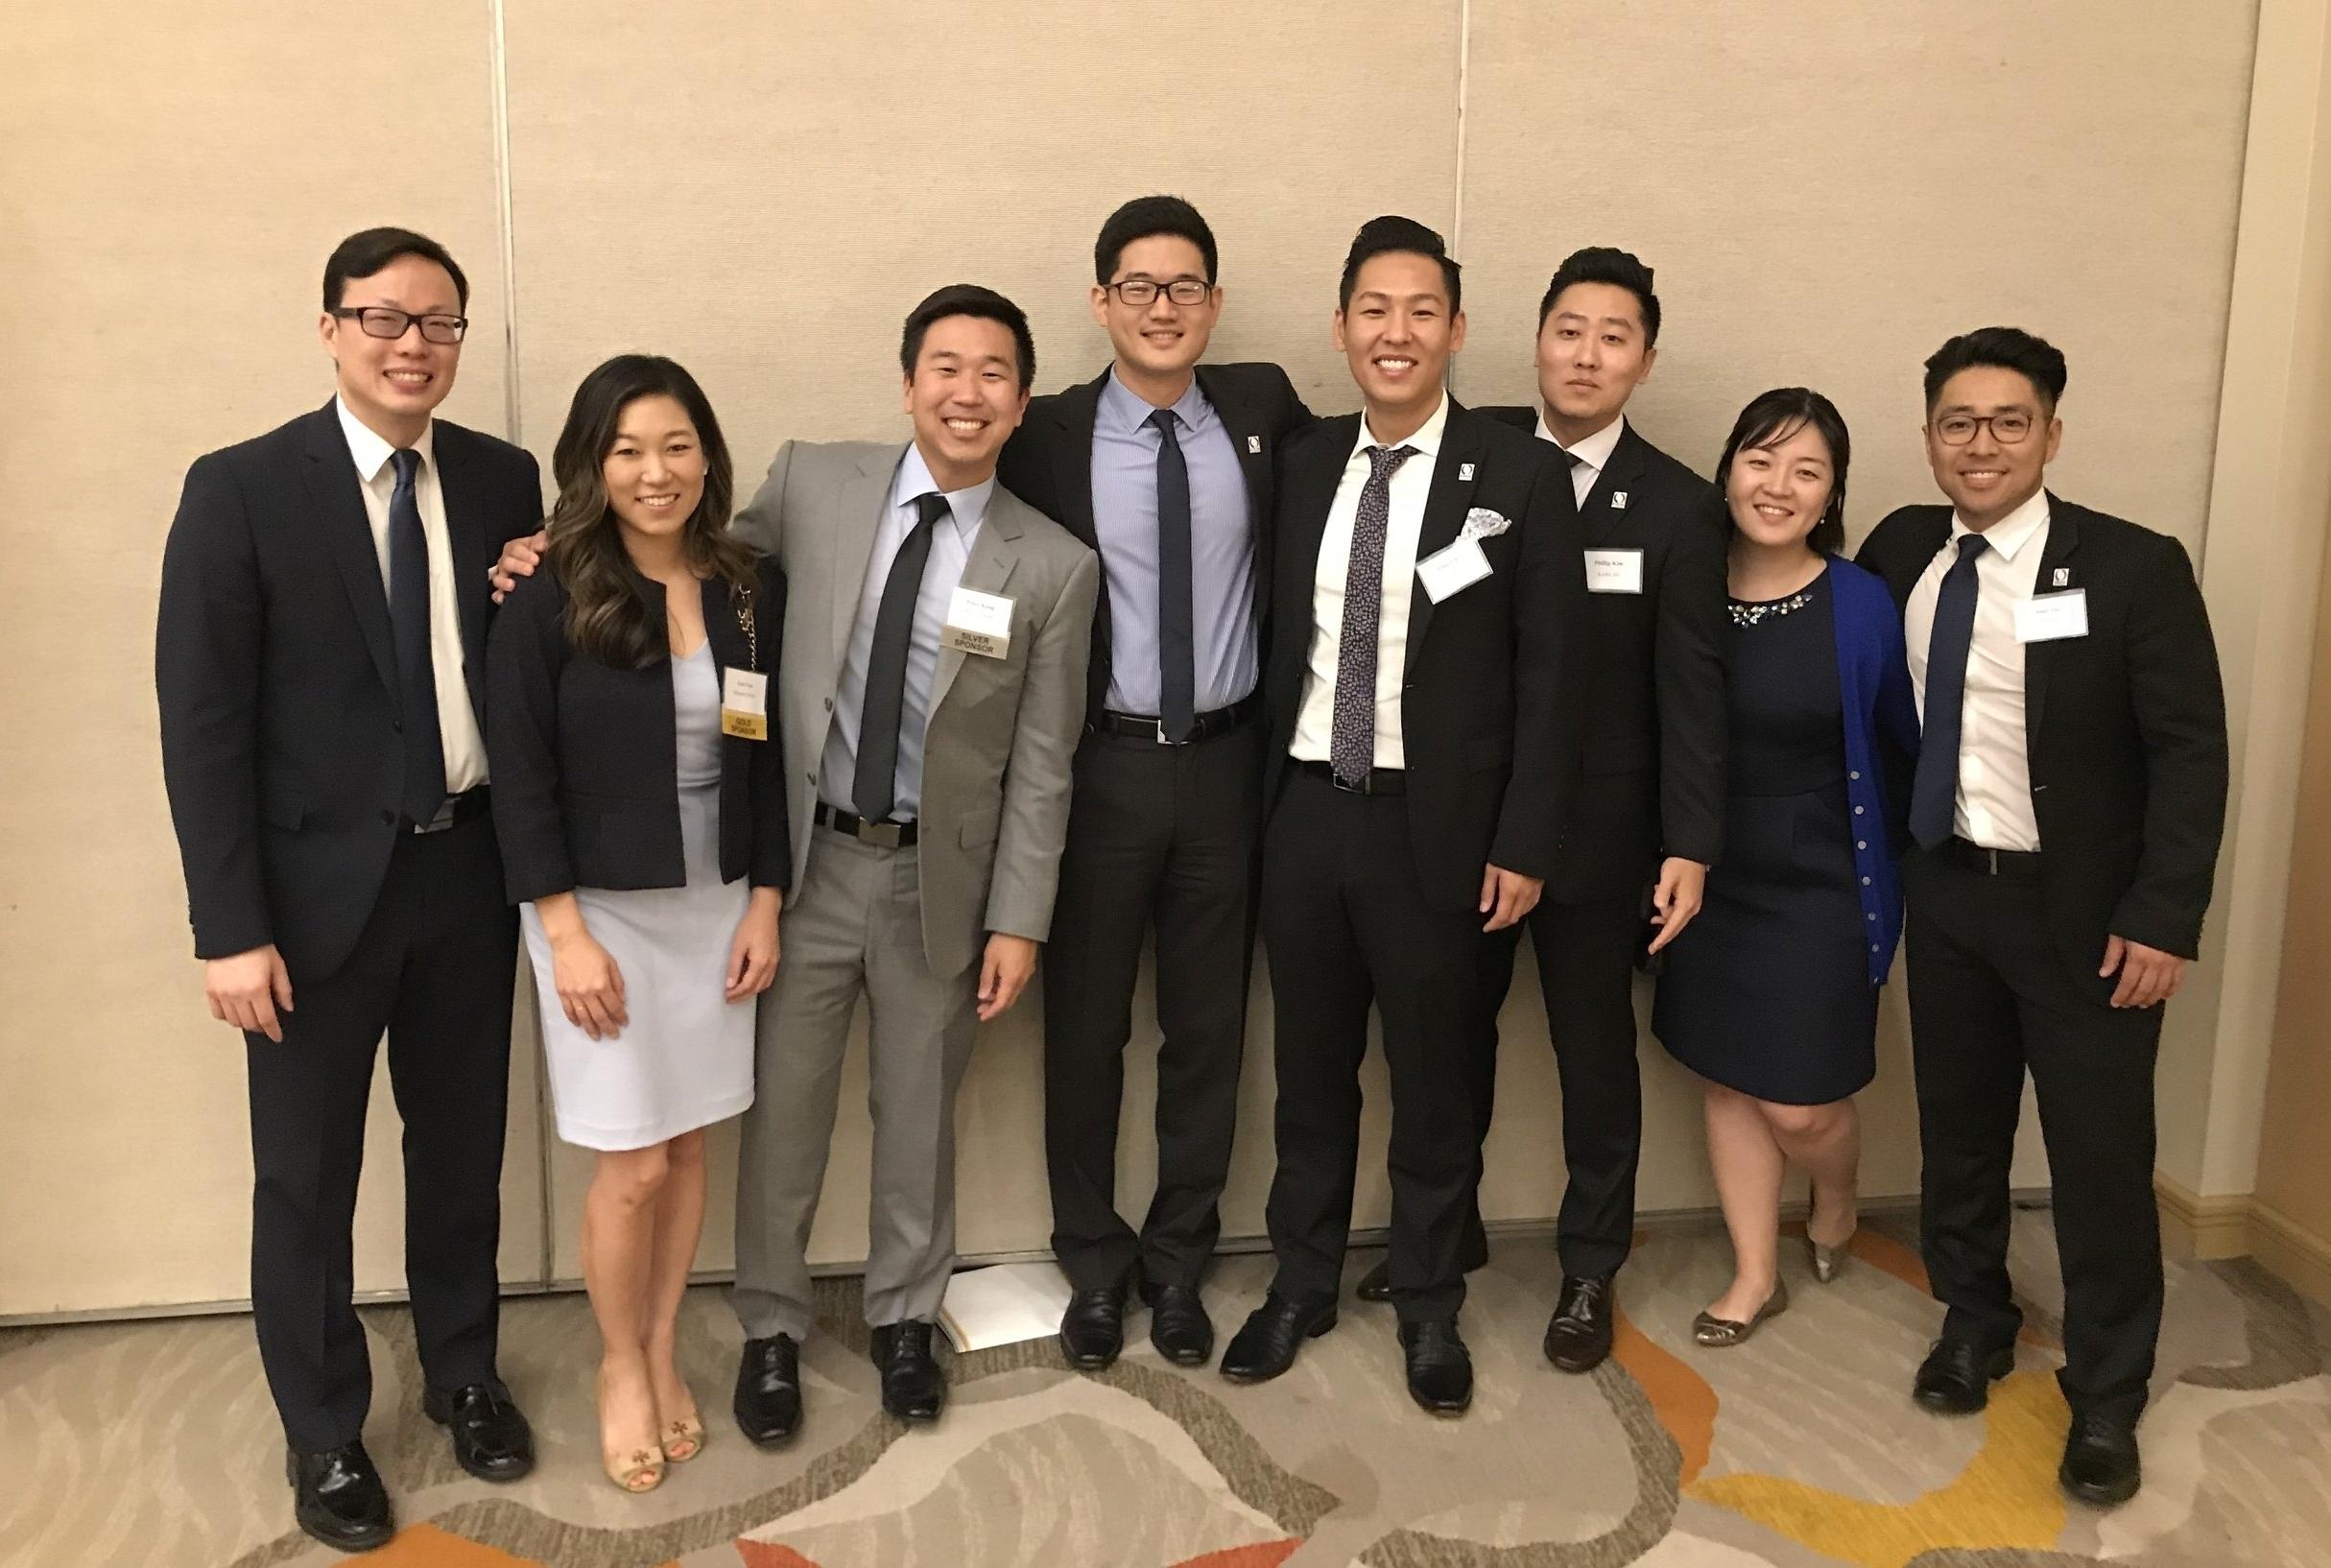 Orange County Korean American Bar Association's 12th Annual Installation Dinner & Awards Ceremony with KABA-SD folks.jpg